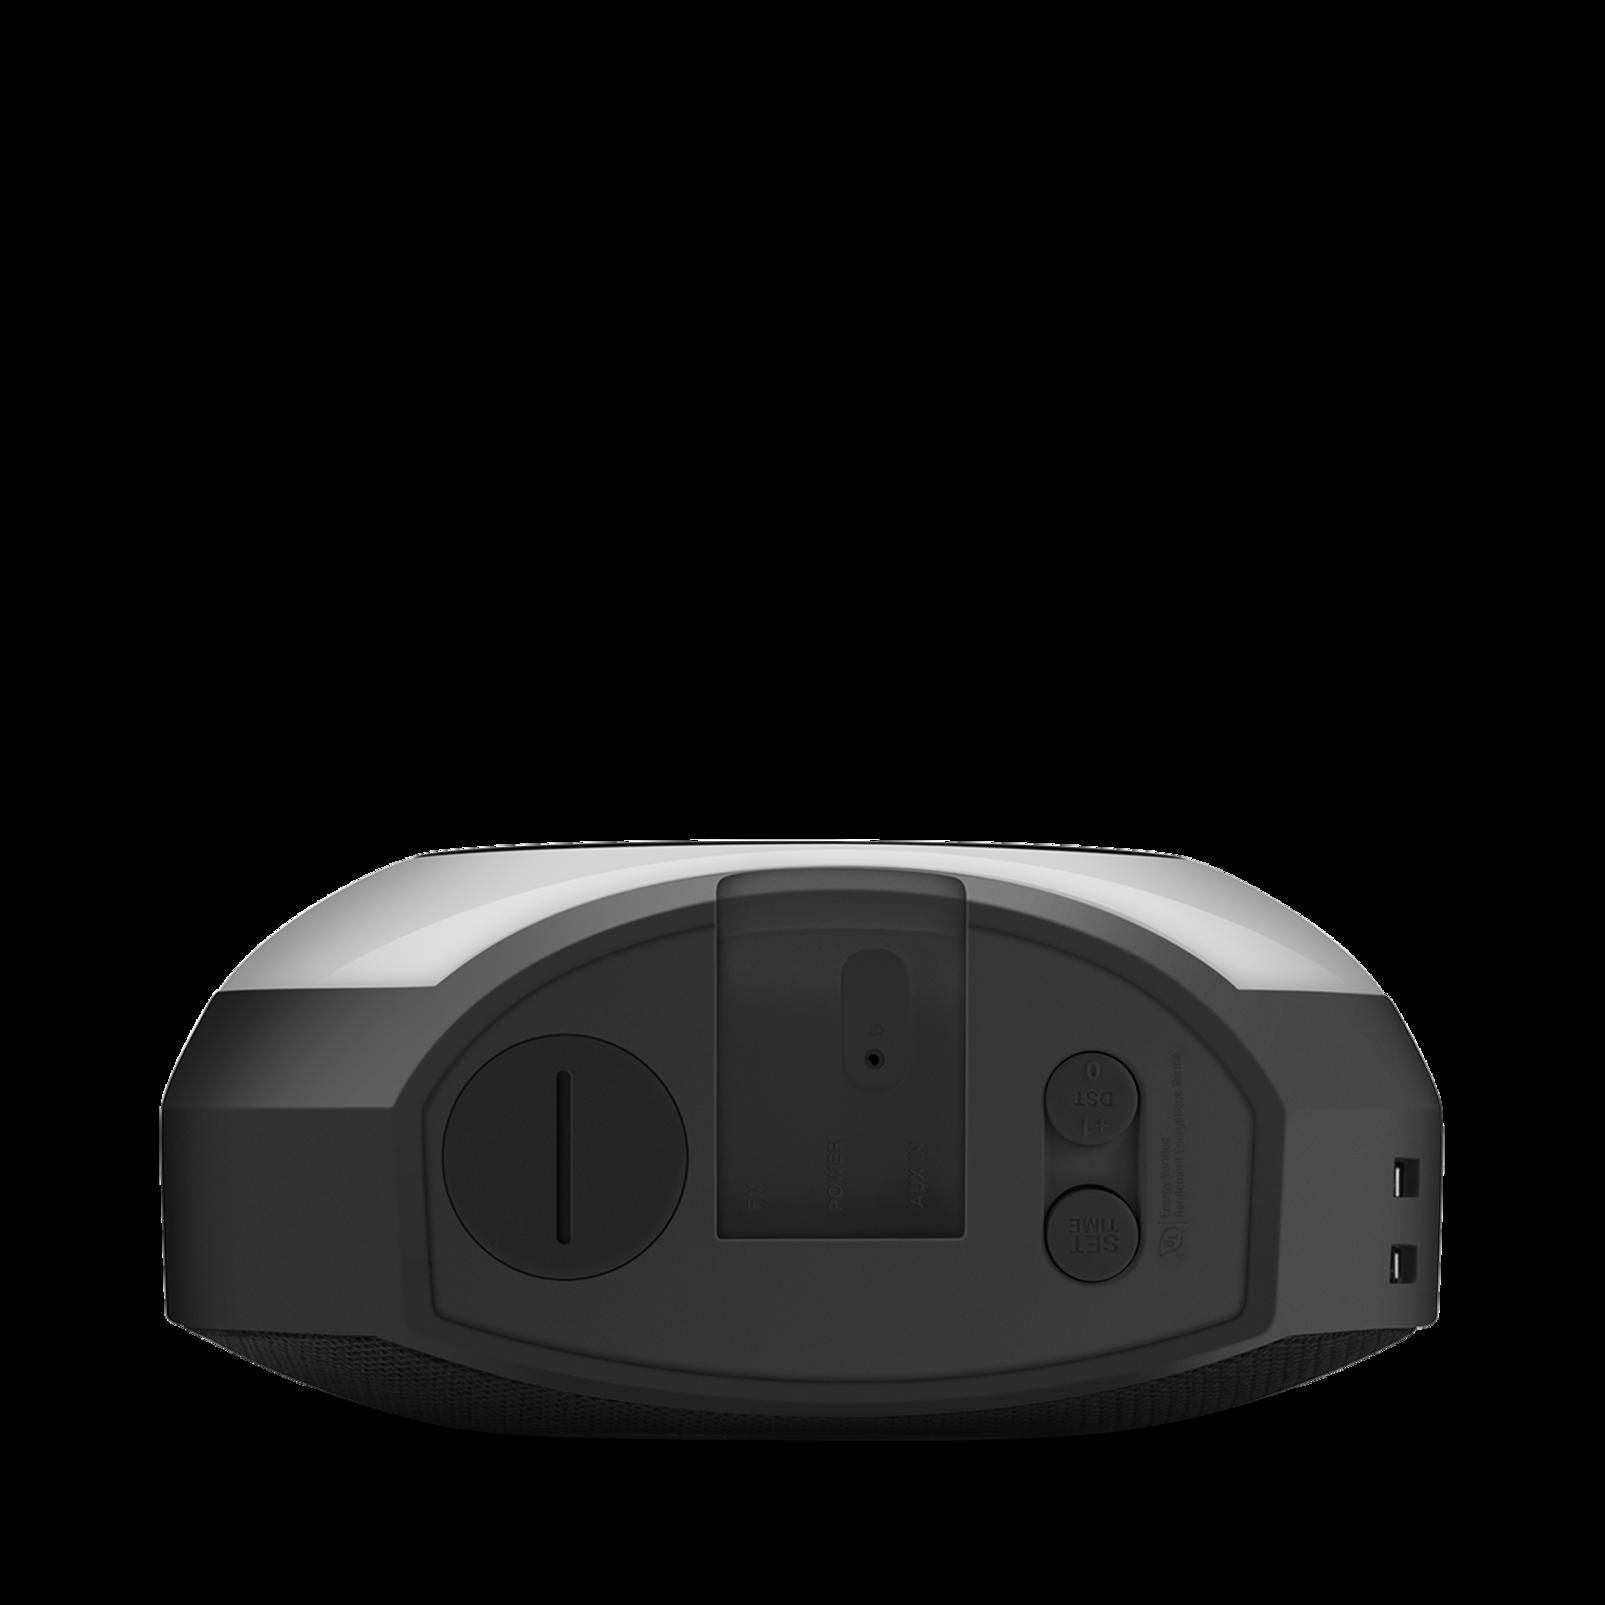 JBL Horizon - Black - Bluetooth clock radio with USB charging and ambient light - Detailshot 4